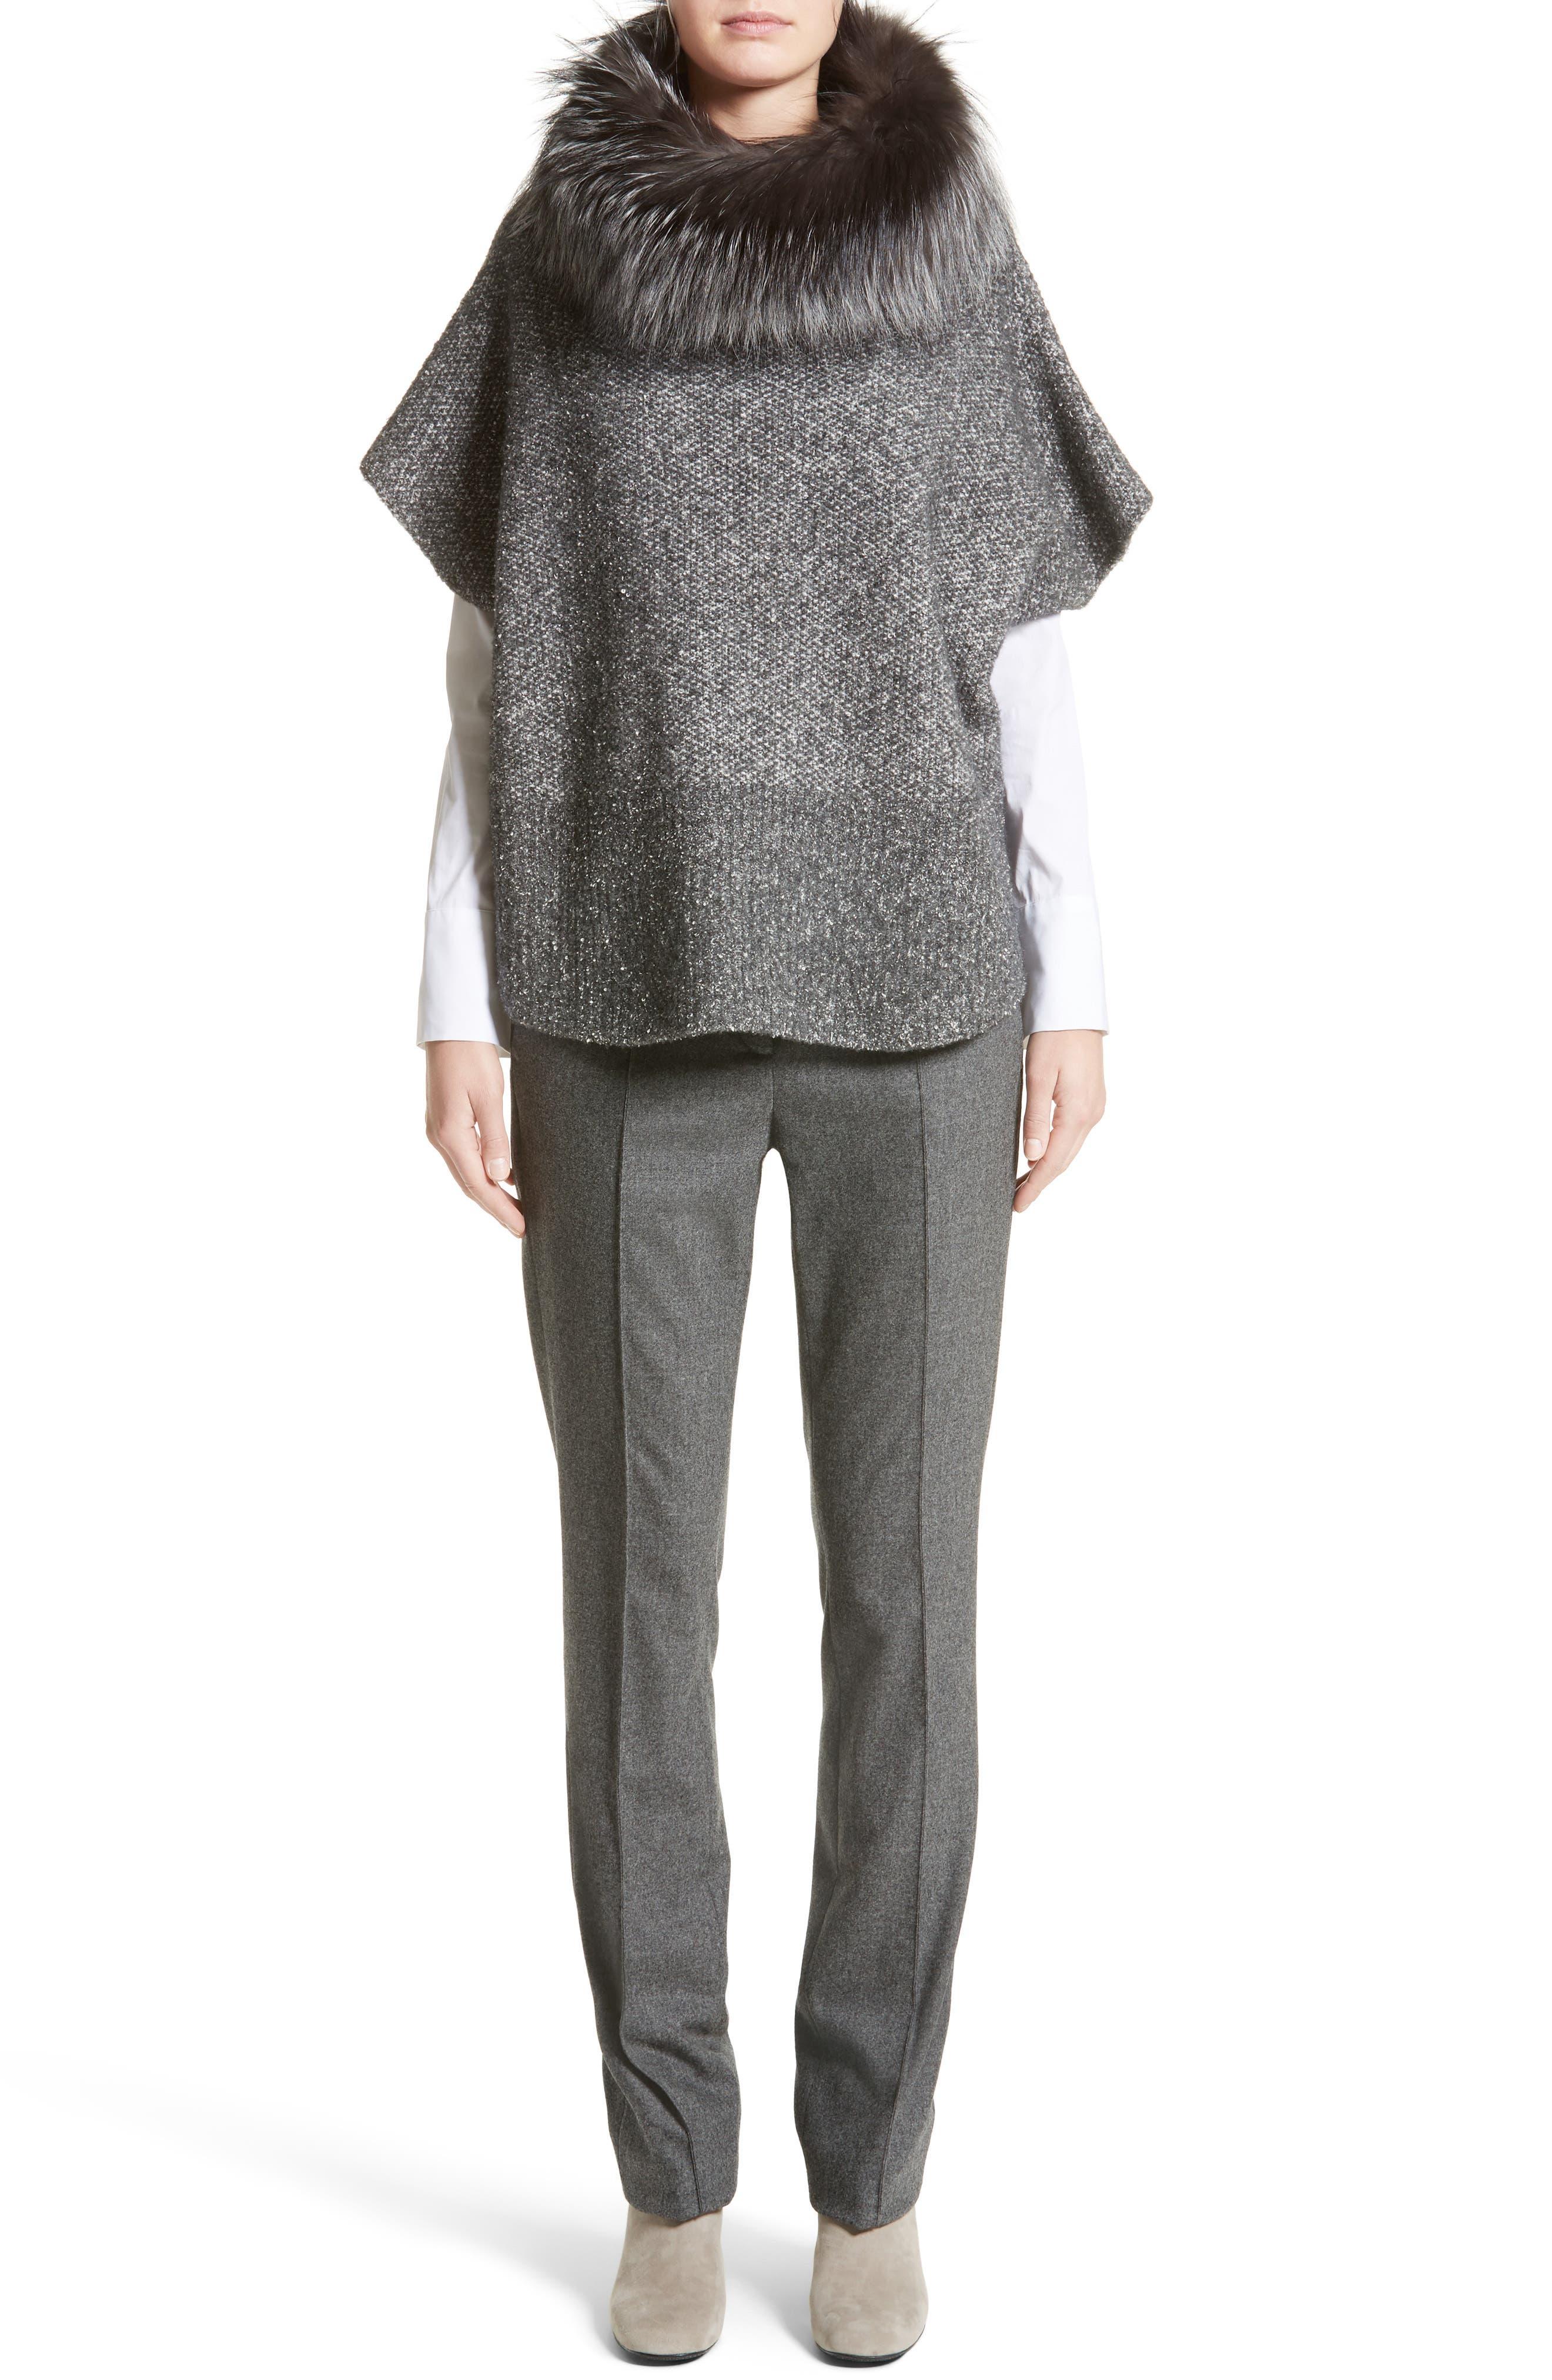 Pebble Tweed Knit Poncho with Genuine Fox Fur Collar,                             Alternate thumbnail 8, color,                             Grey Multi